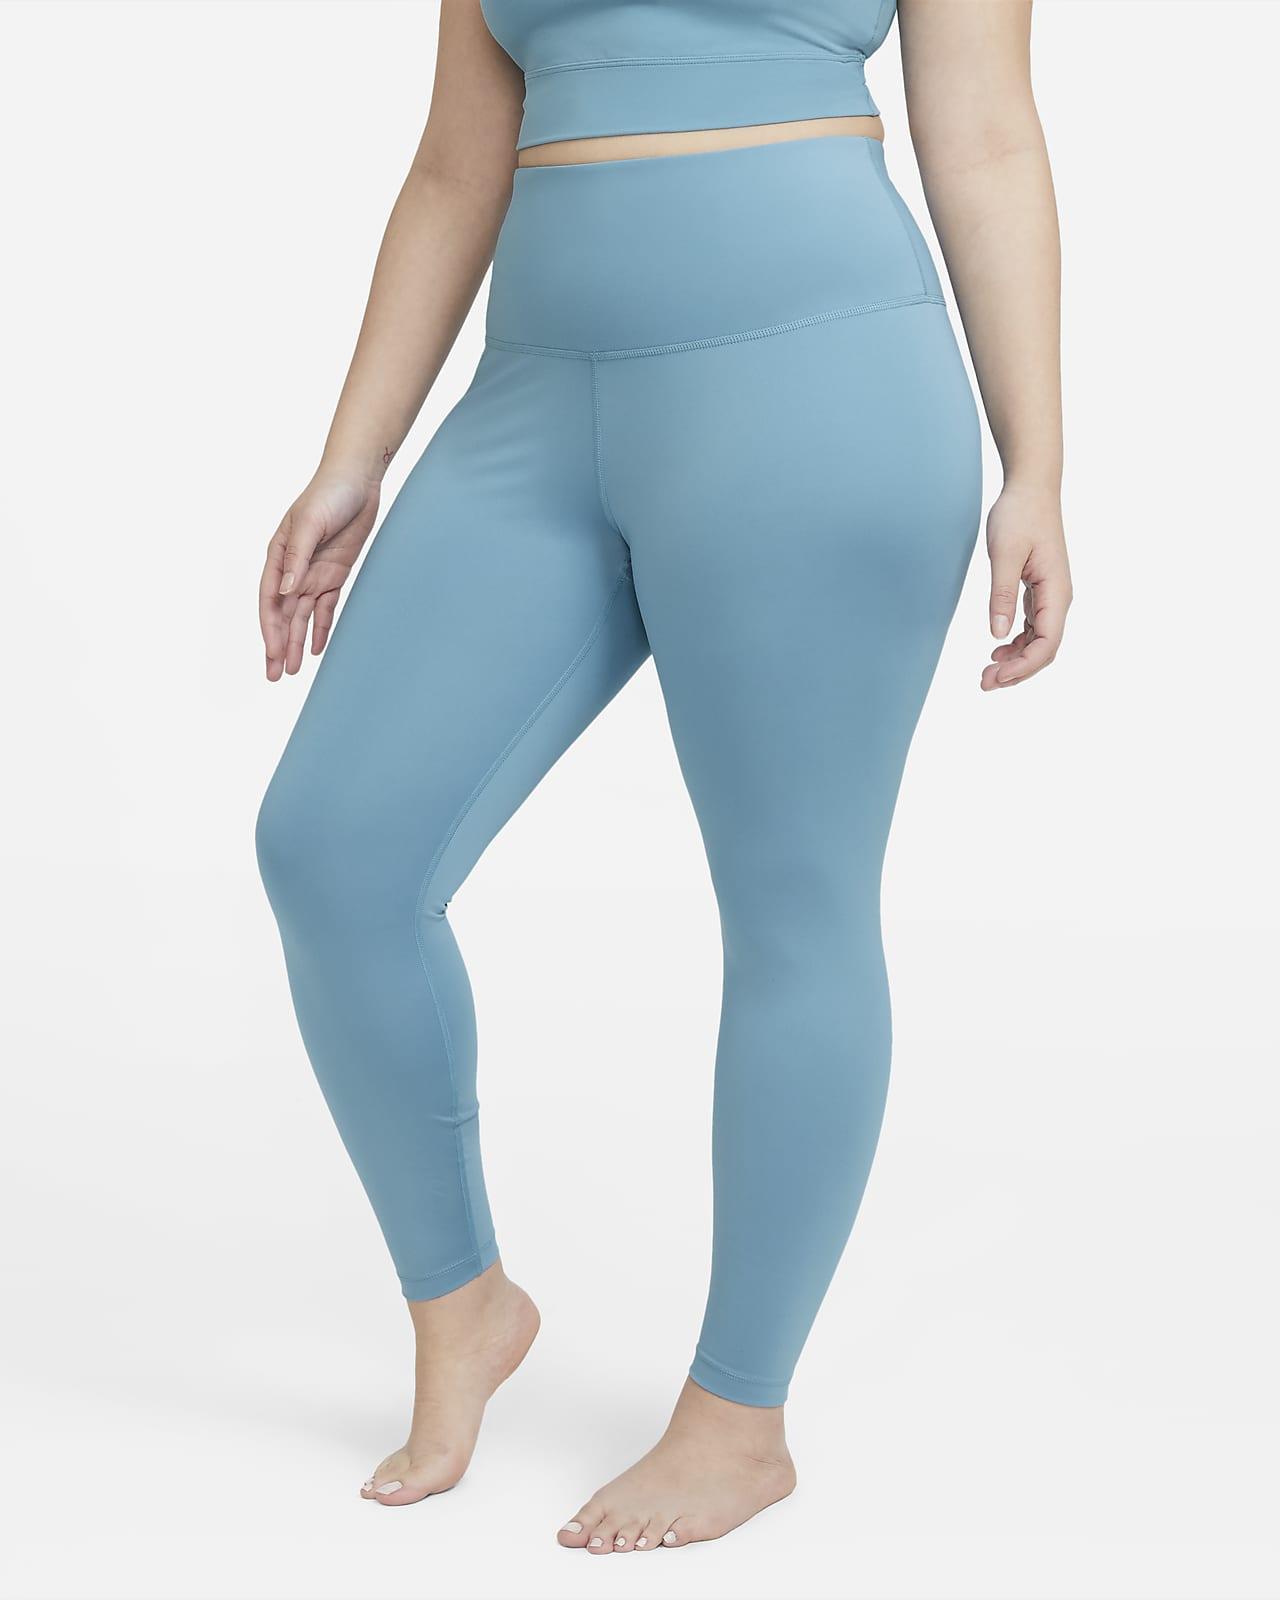 Nike Yoga-7/8-leggings med høj talje til kvinder (plus size)